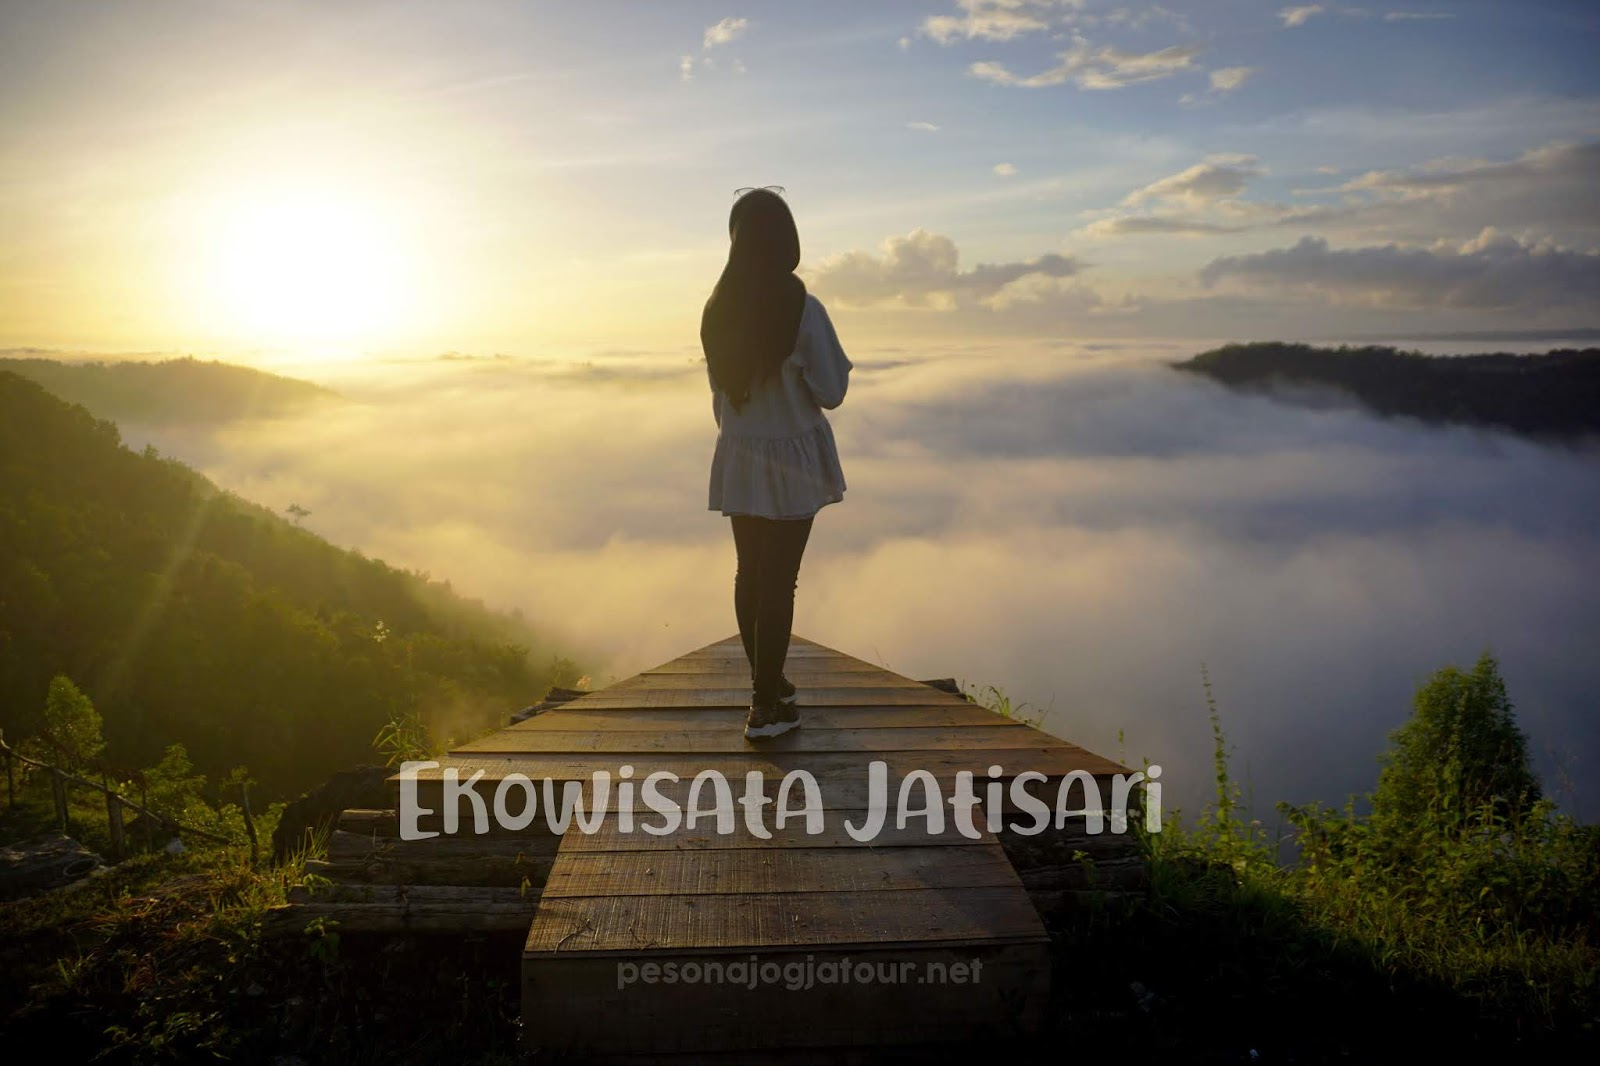 Ekowisata Jatisari